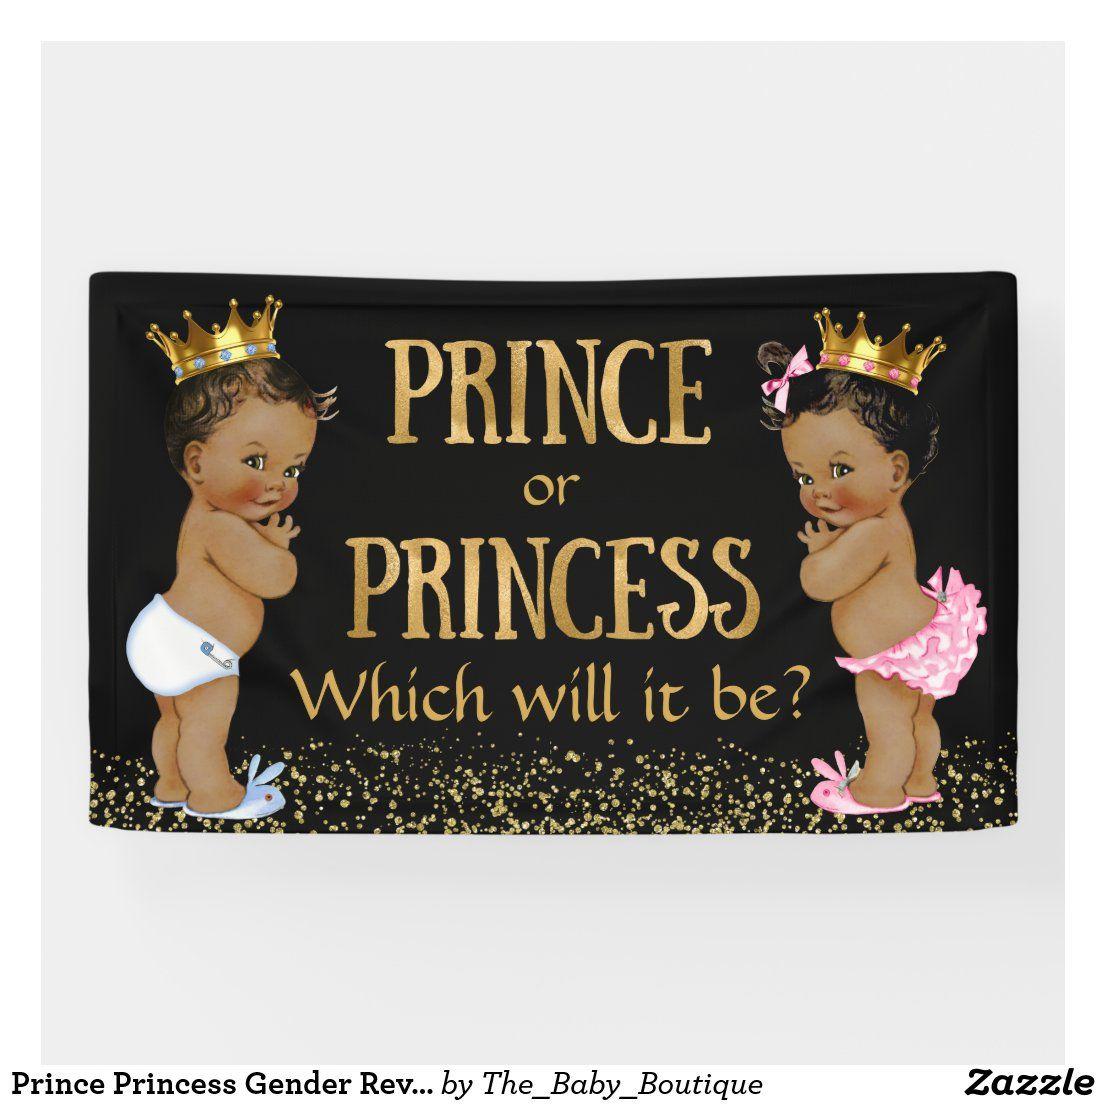 Prince Princess Gender Reveal Baby Shower Banner Zazzle Com In 2021 Baby Shower Gender Reveal Gender Reveal Banner Baby Gender Reveal Party